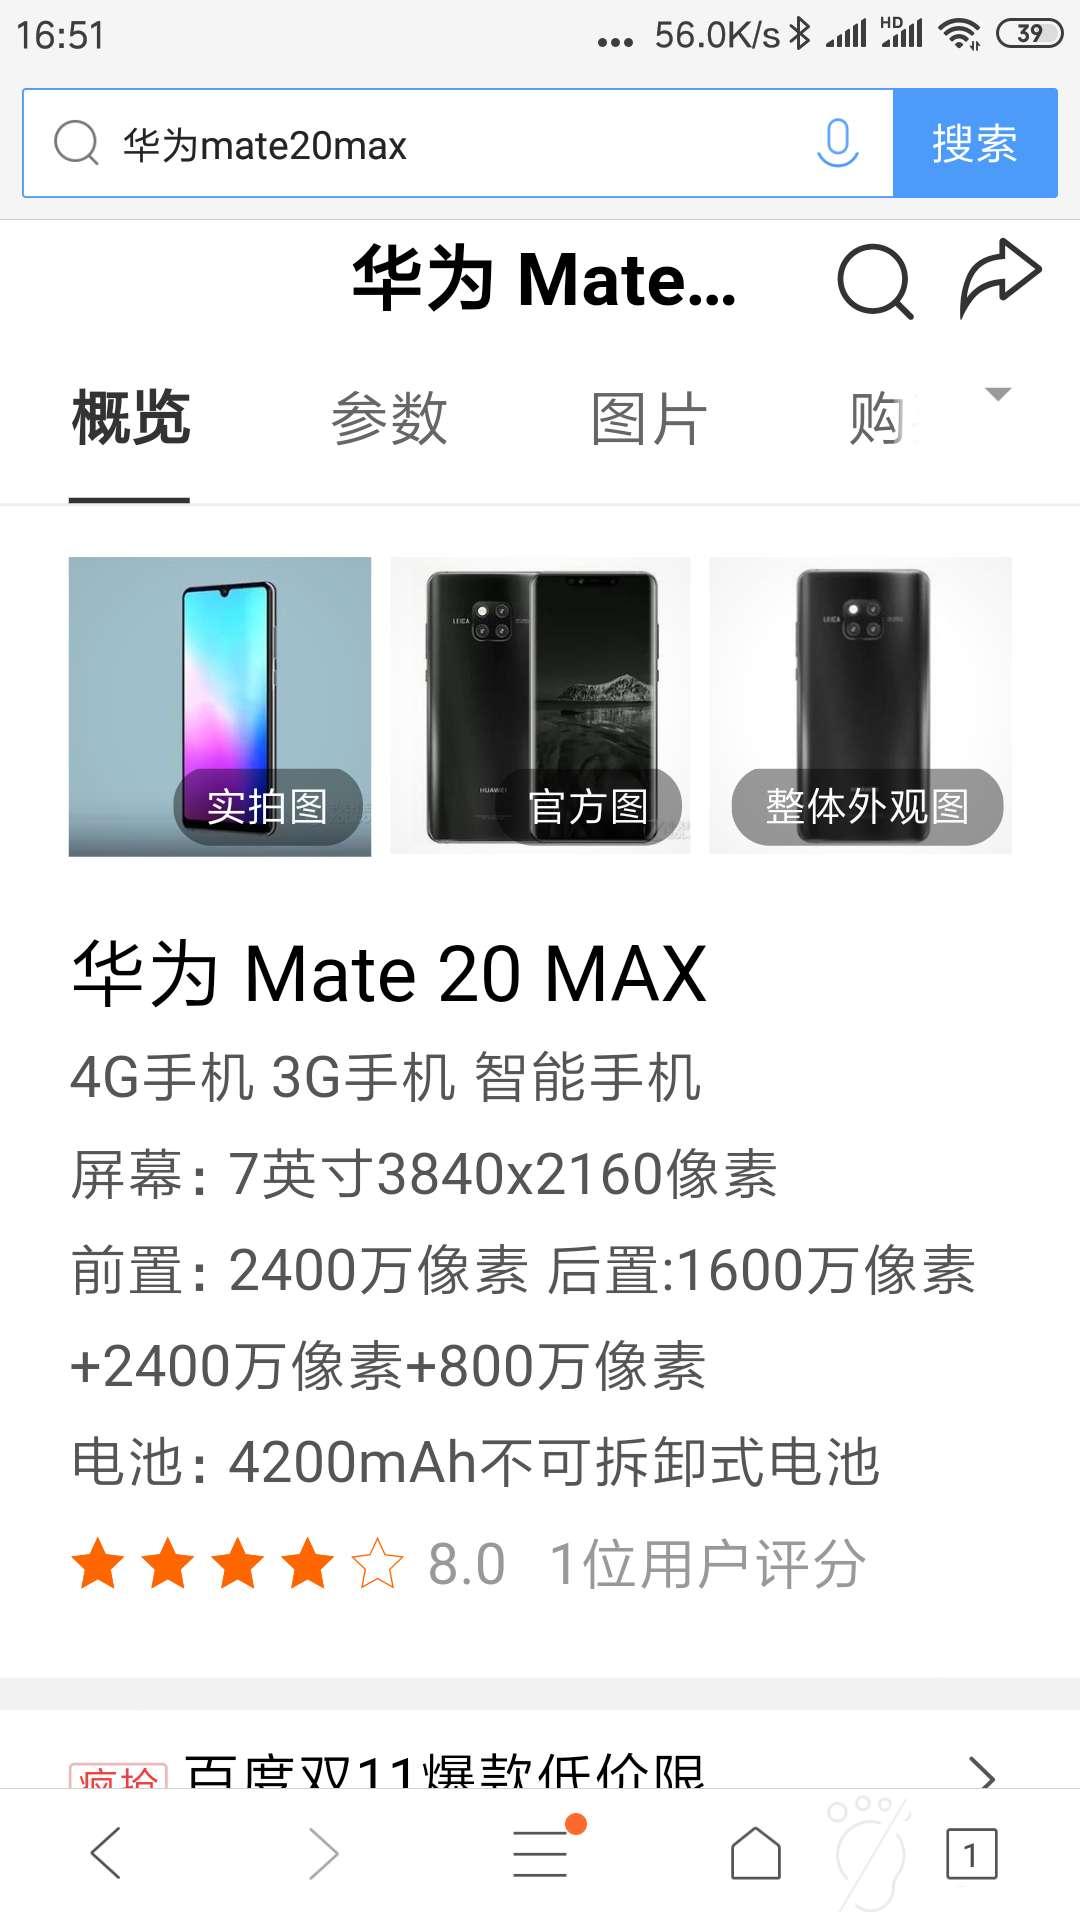 华为Mate 20 MAX 售价是多少?